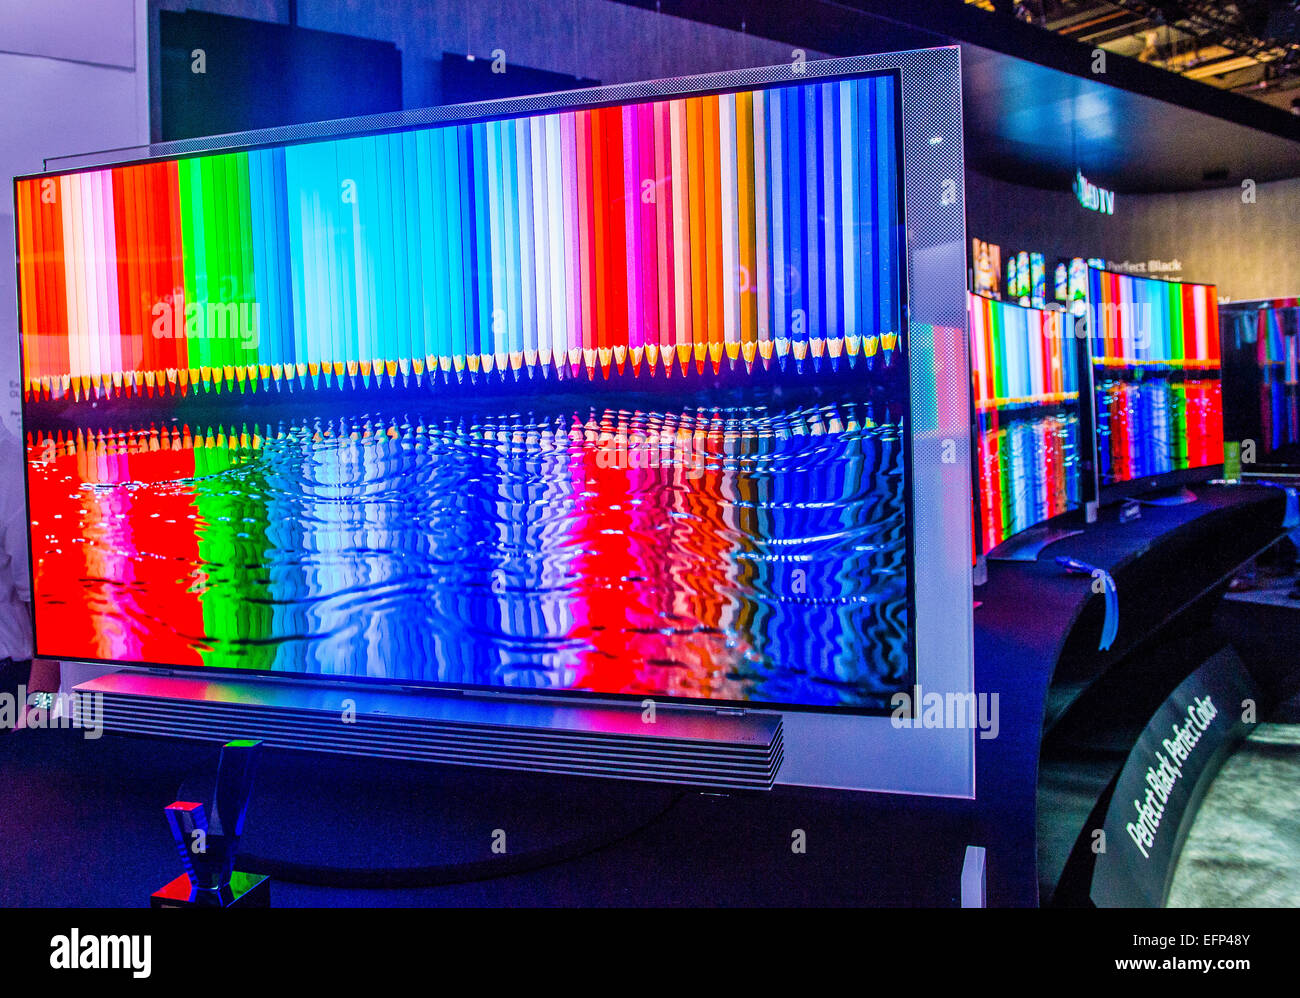 La LG stand al CES show tenutosi a Las Vegas Foto Stock